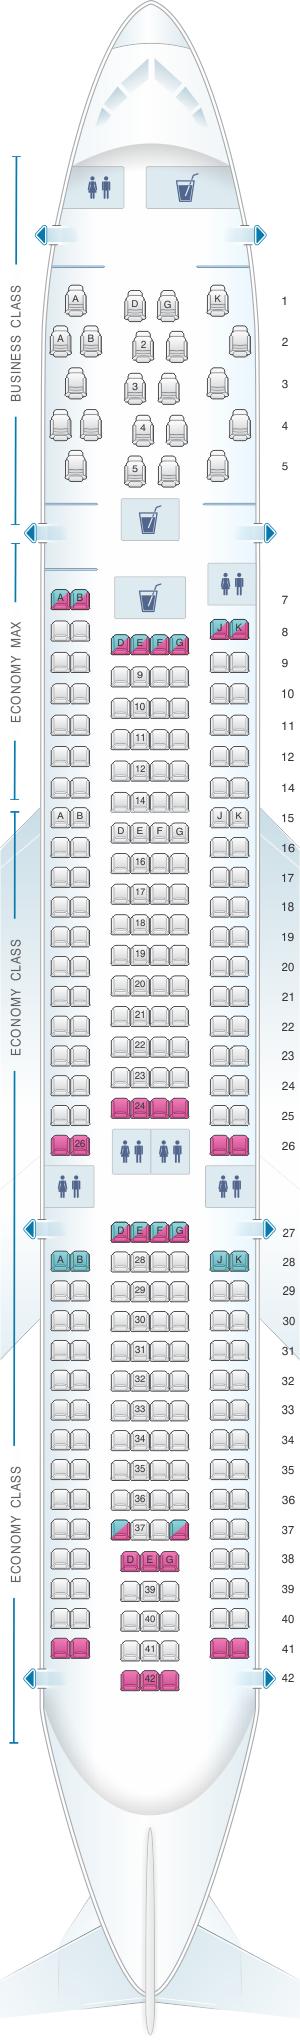 Seat Map Edelweiss Air Airbus A330 200